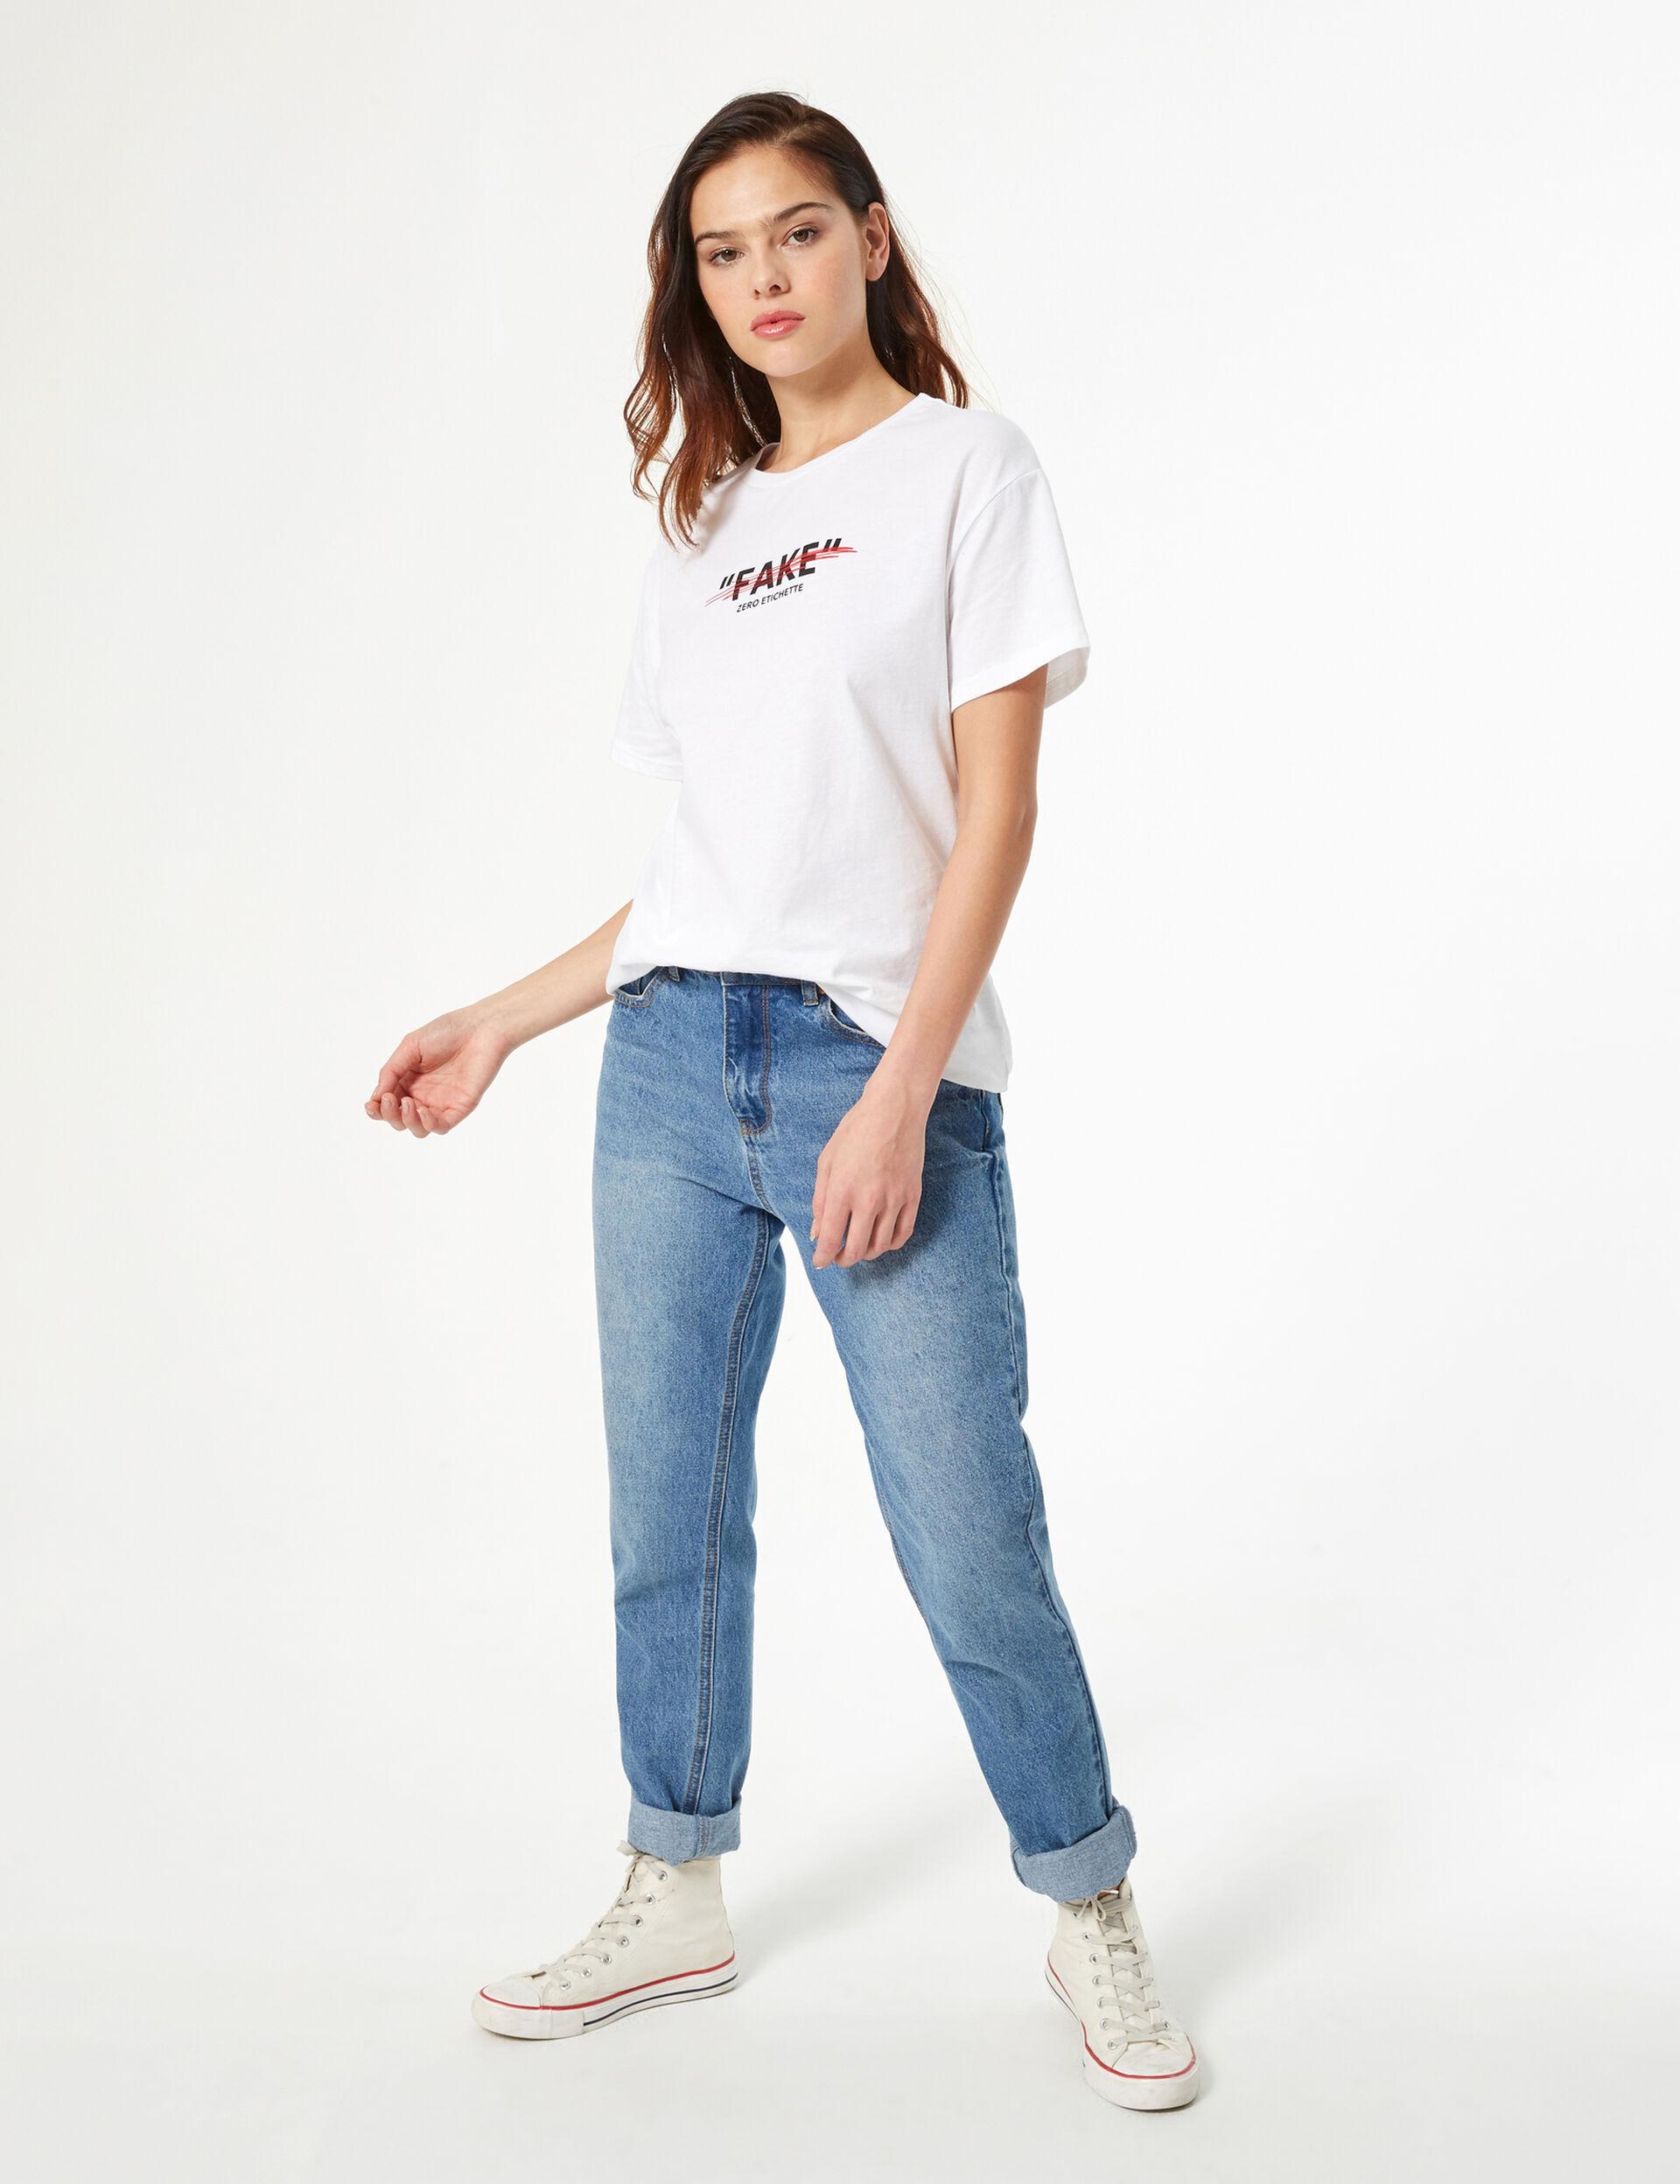 'Don't call me fake' T-shirt